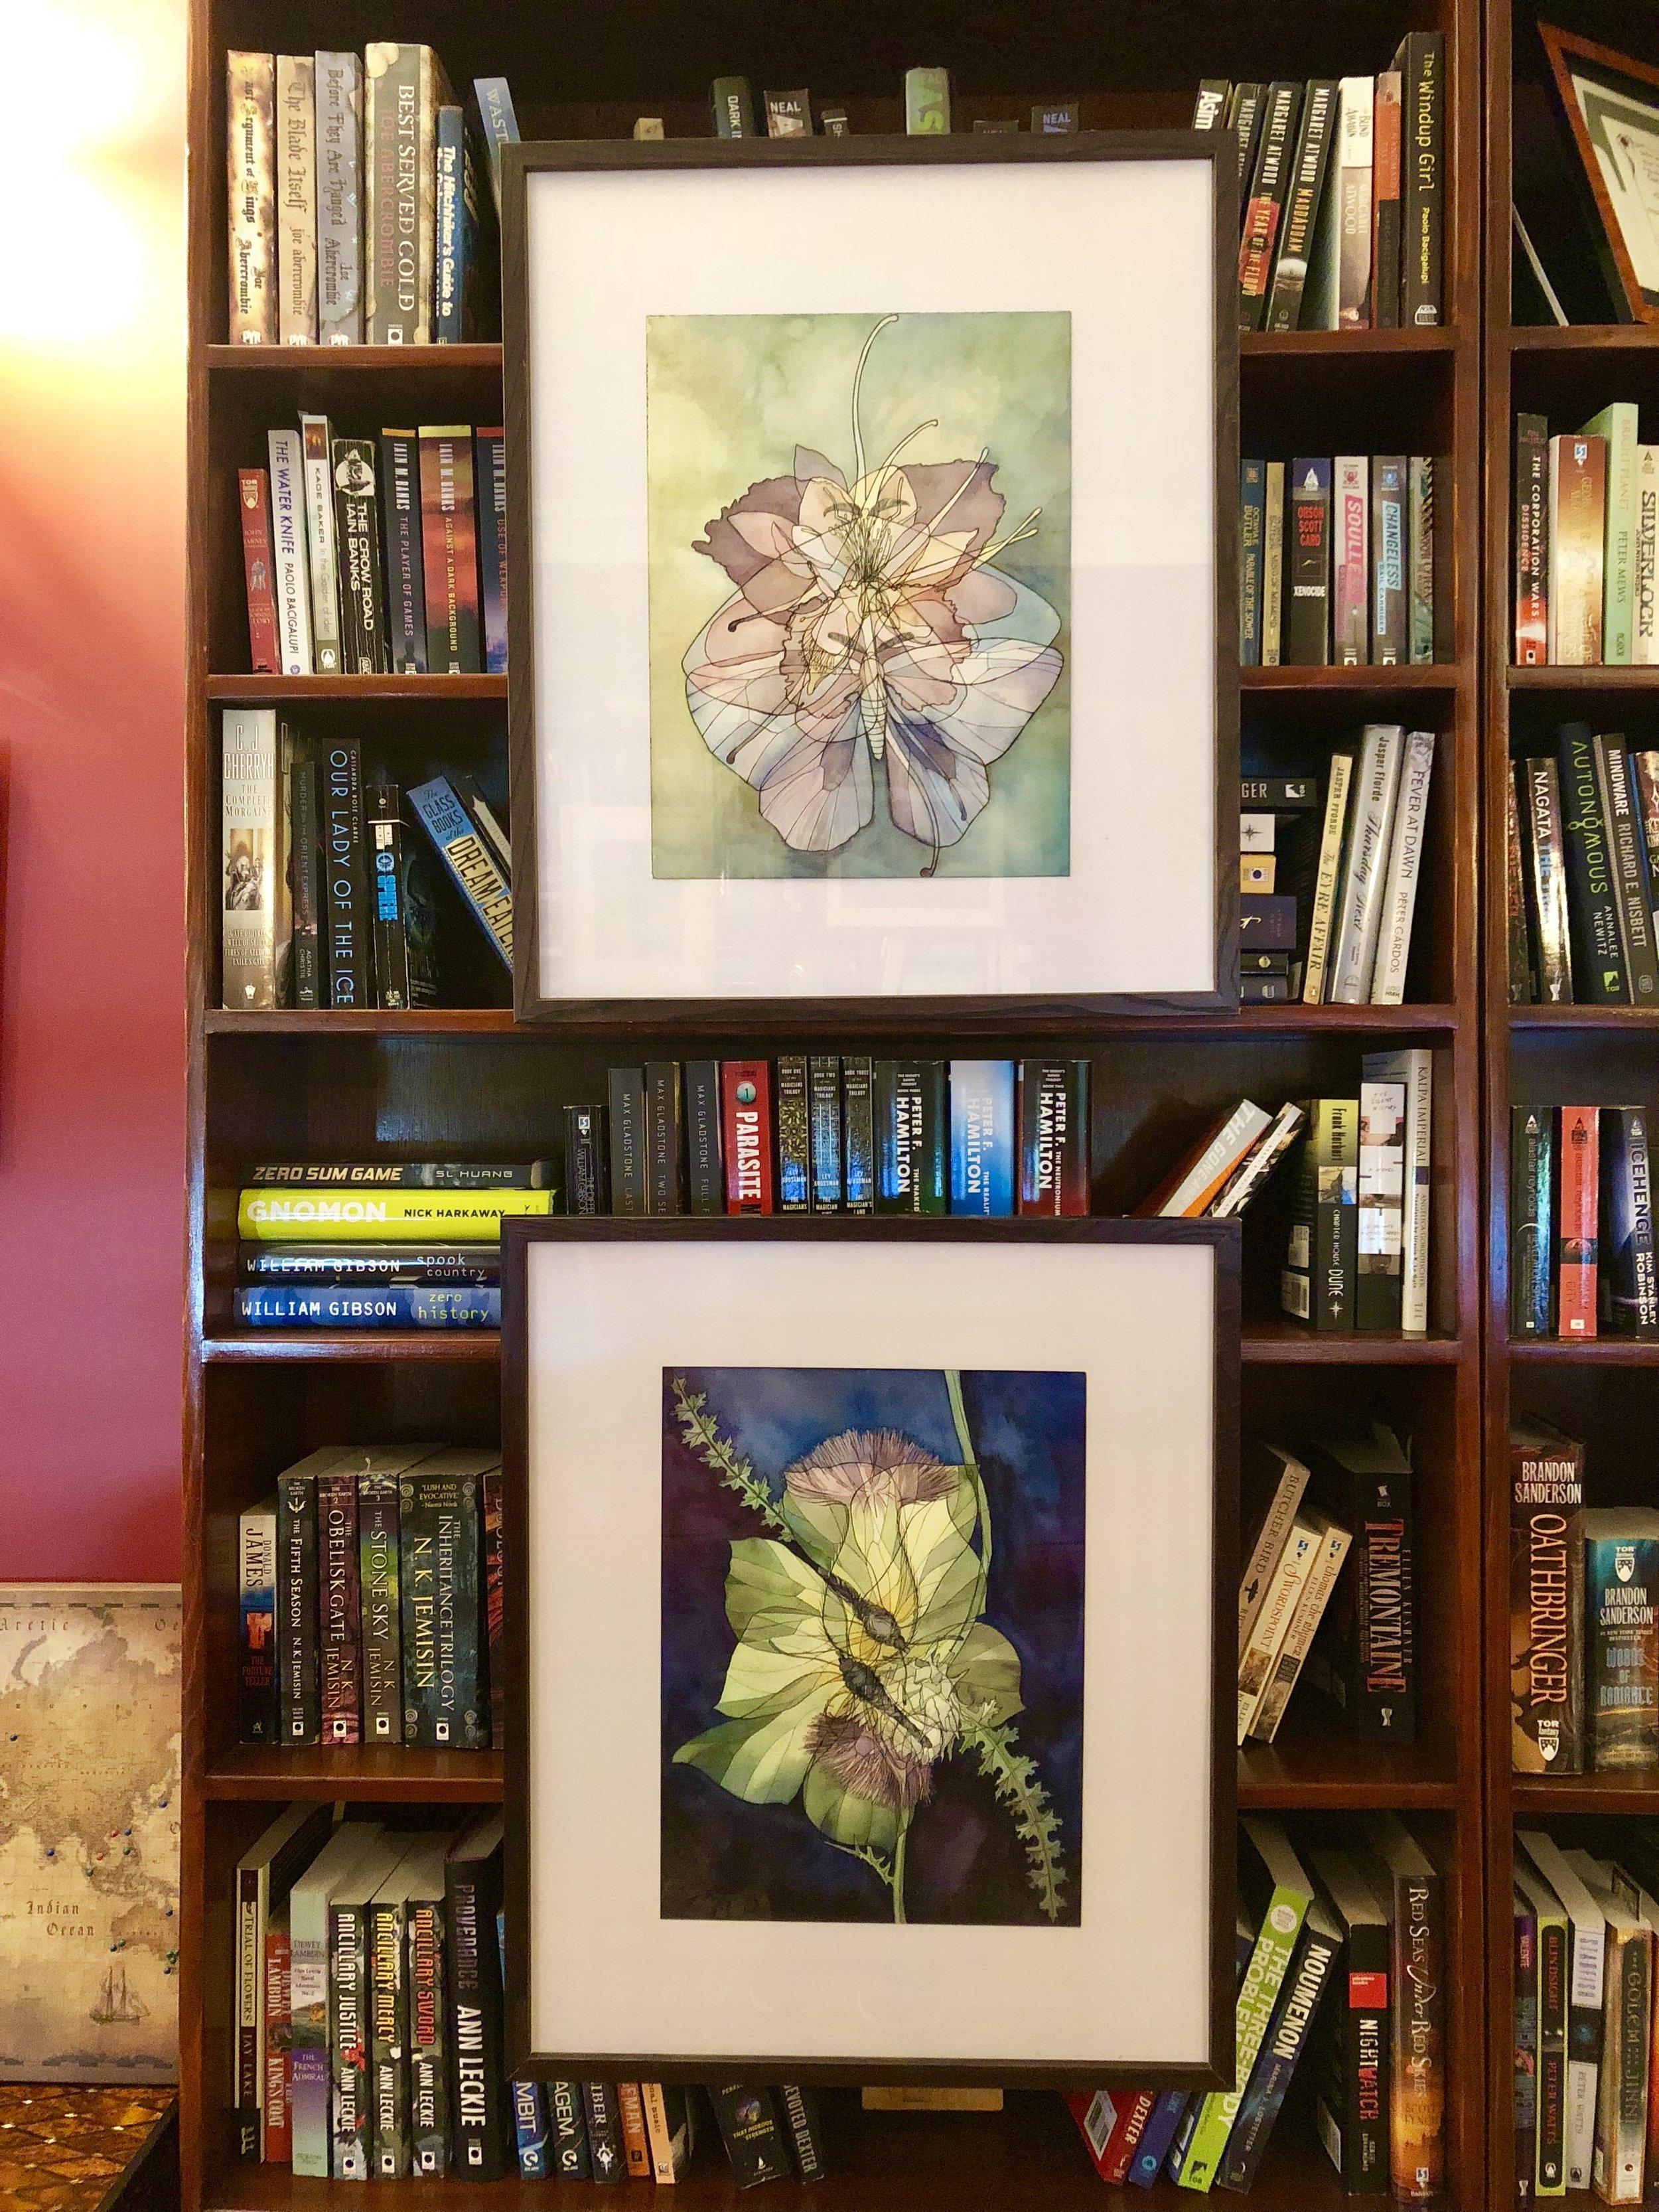 Moth X Iris X Columbine (top), Brimstone X Thistle (bottom), ink and watercolor on paper.